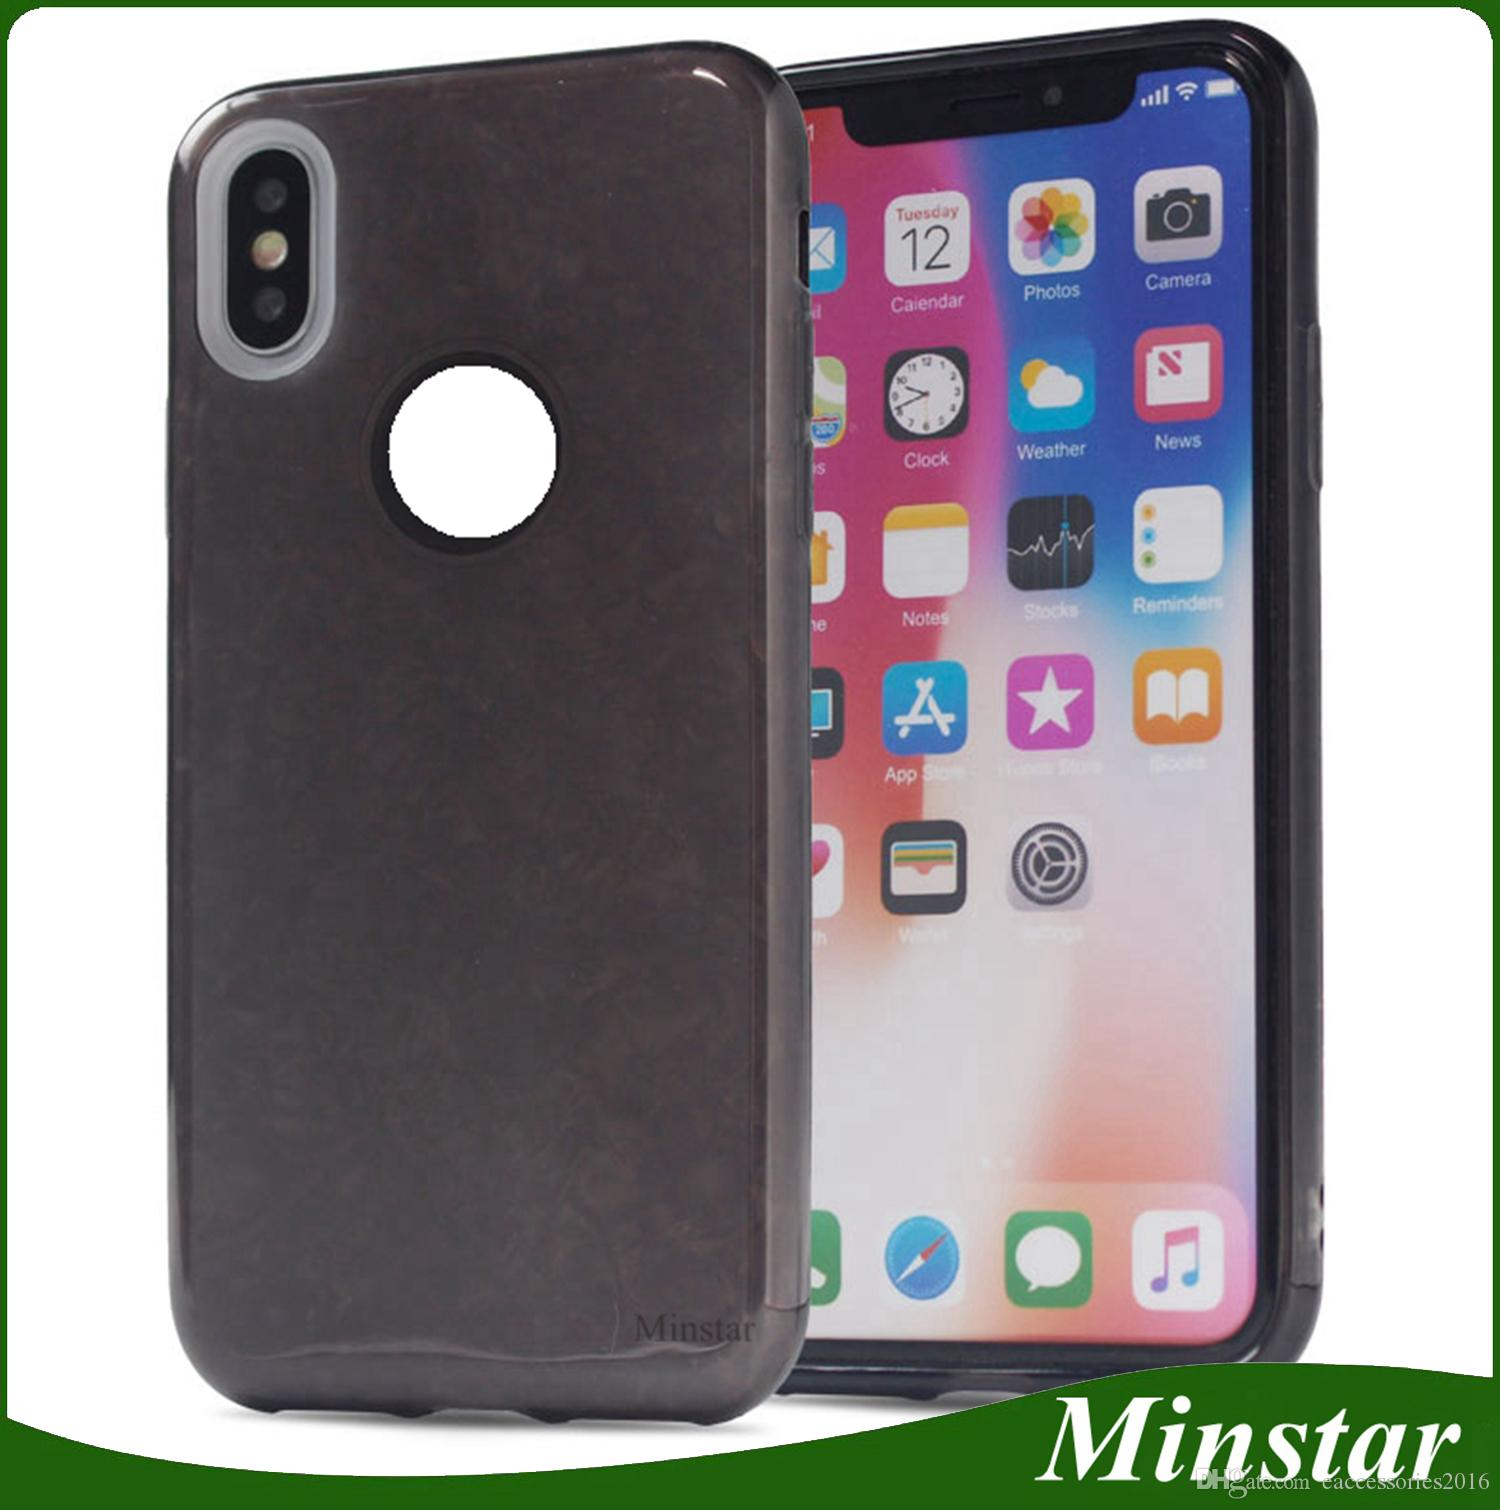 Gkk Shield All Inclusive Ultra Thin Pc Hard Cover Phone Case For Peonia Electroplating Transparent Ultrathin Samsung J7 Pro 2017 Hitam Galaxy J730 J5 J530 J3 J330 European Version Light